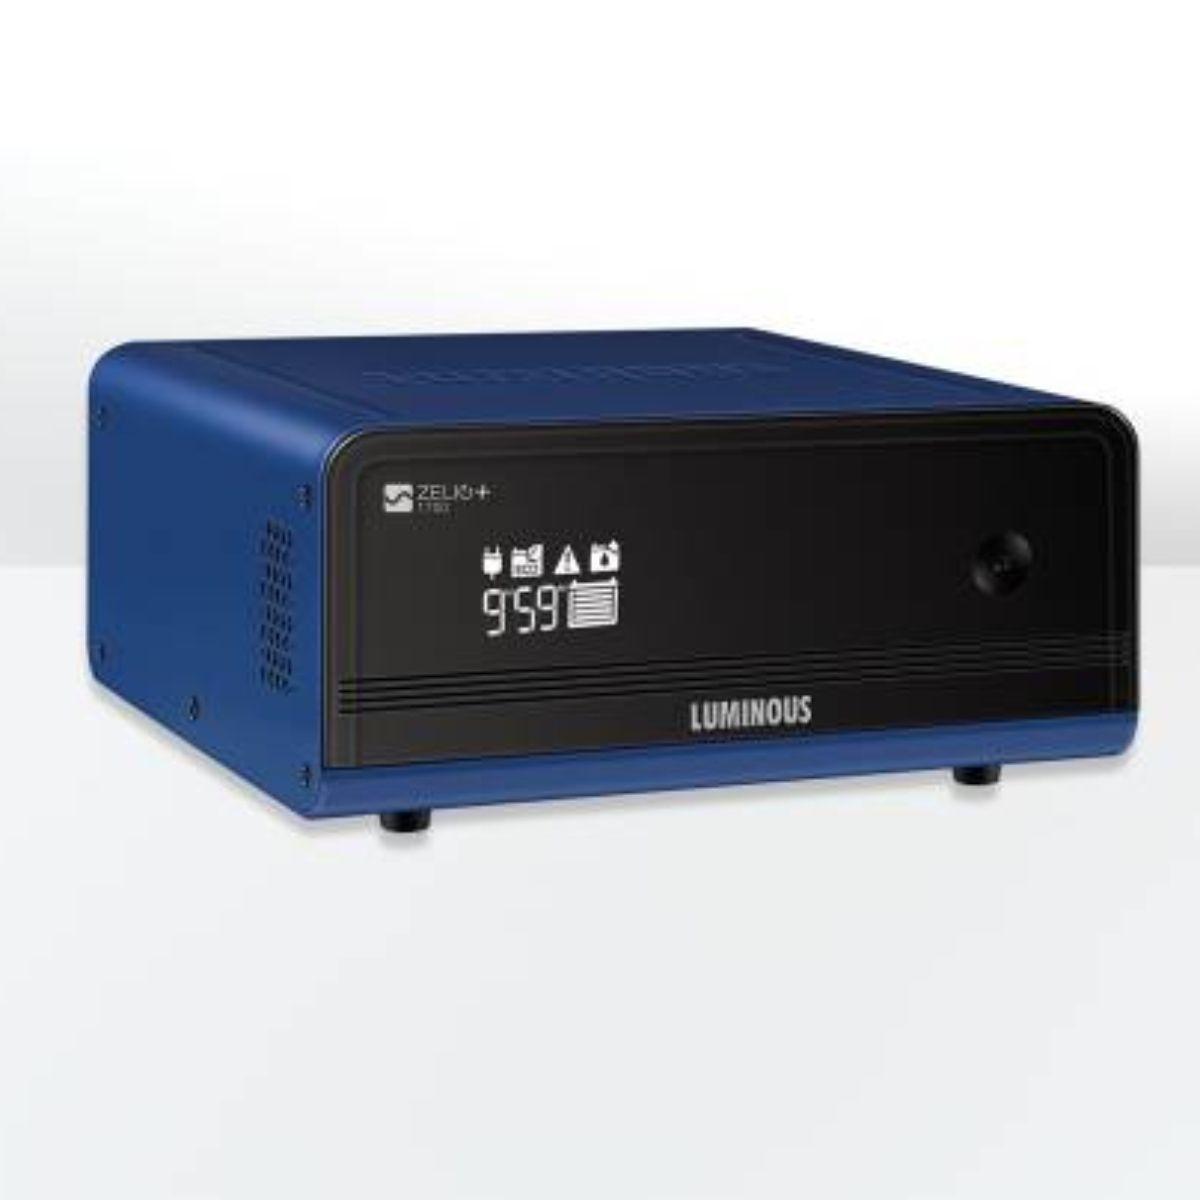 LUMINOUS Zelio+1700 Pure Sine Wave Inverter